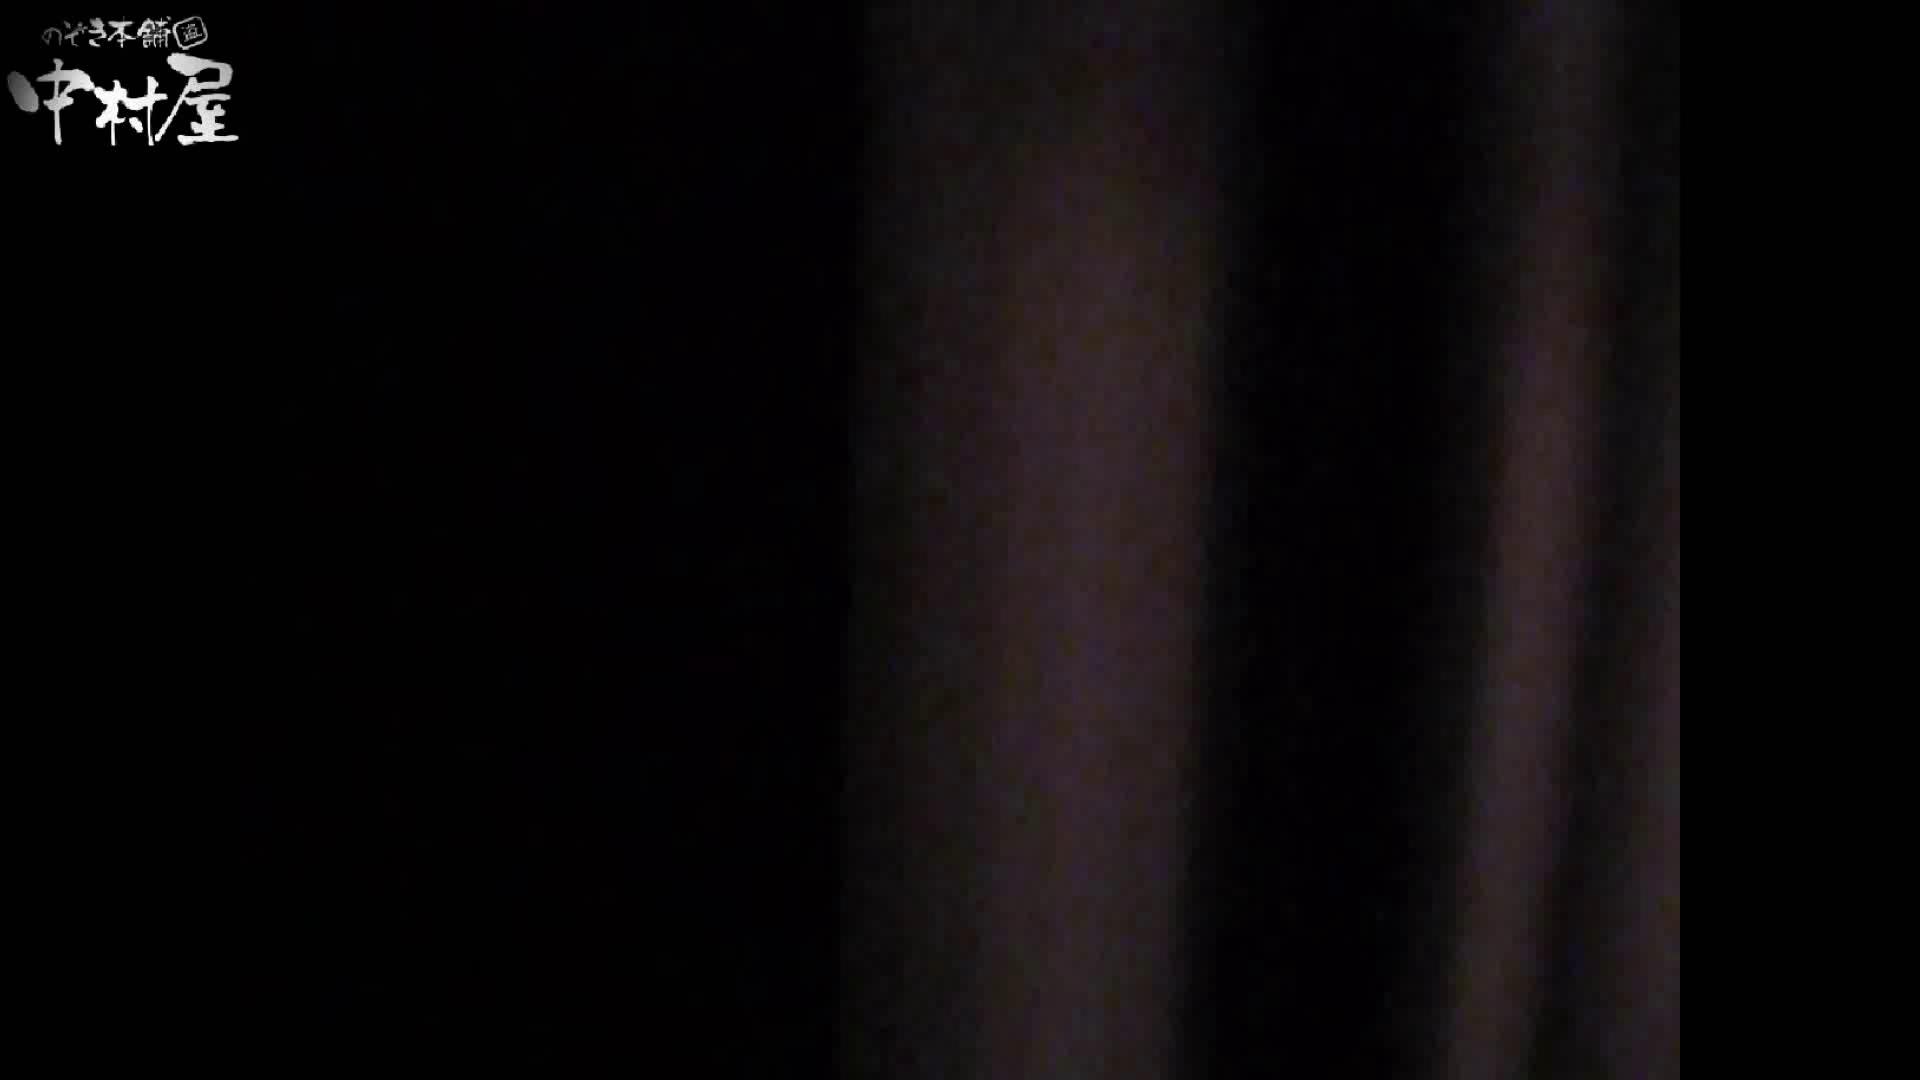 民家風呂専門盗撮師の超危険映像 vol.020 盗撮シリーズ オマンコ無修正動画無料 93PIX 2